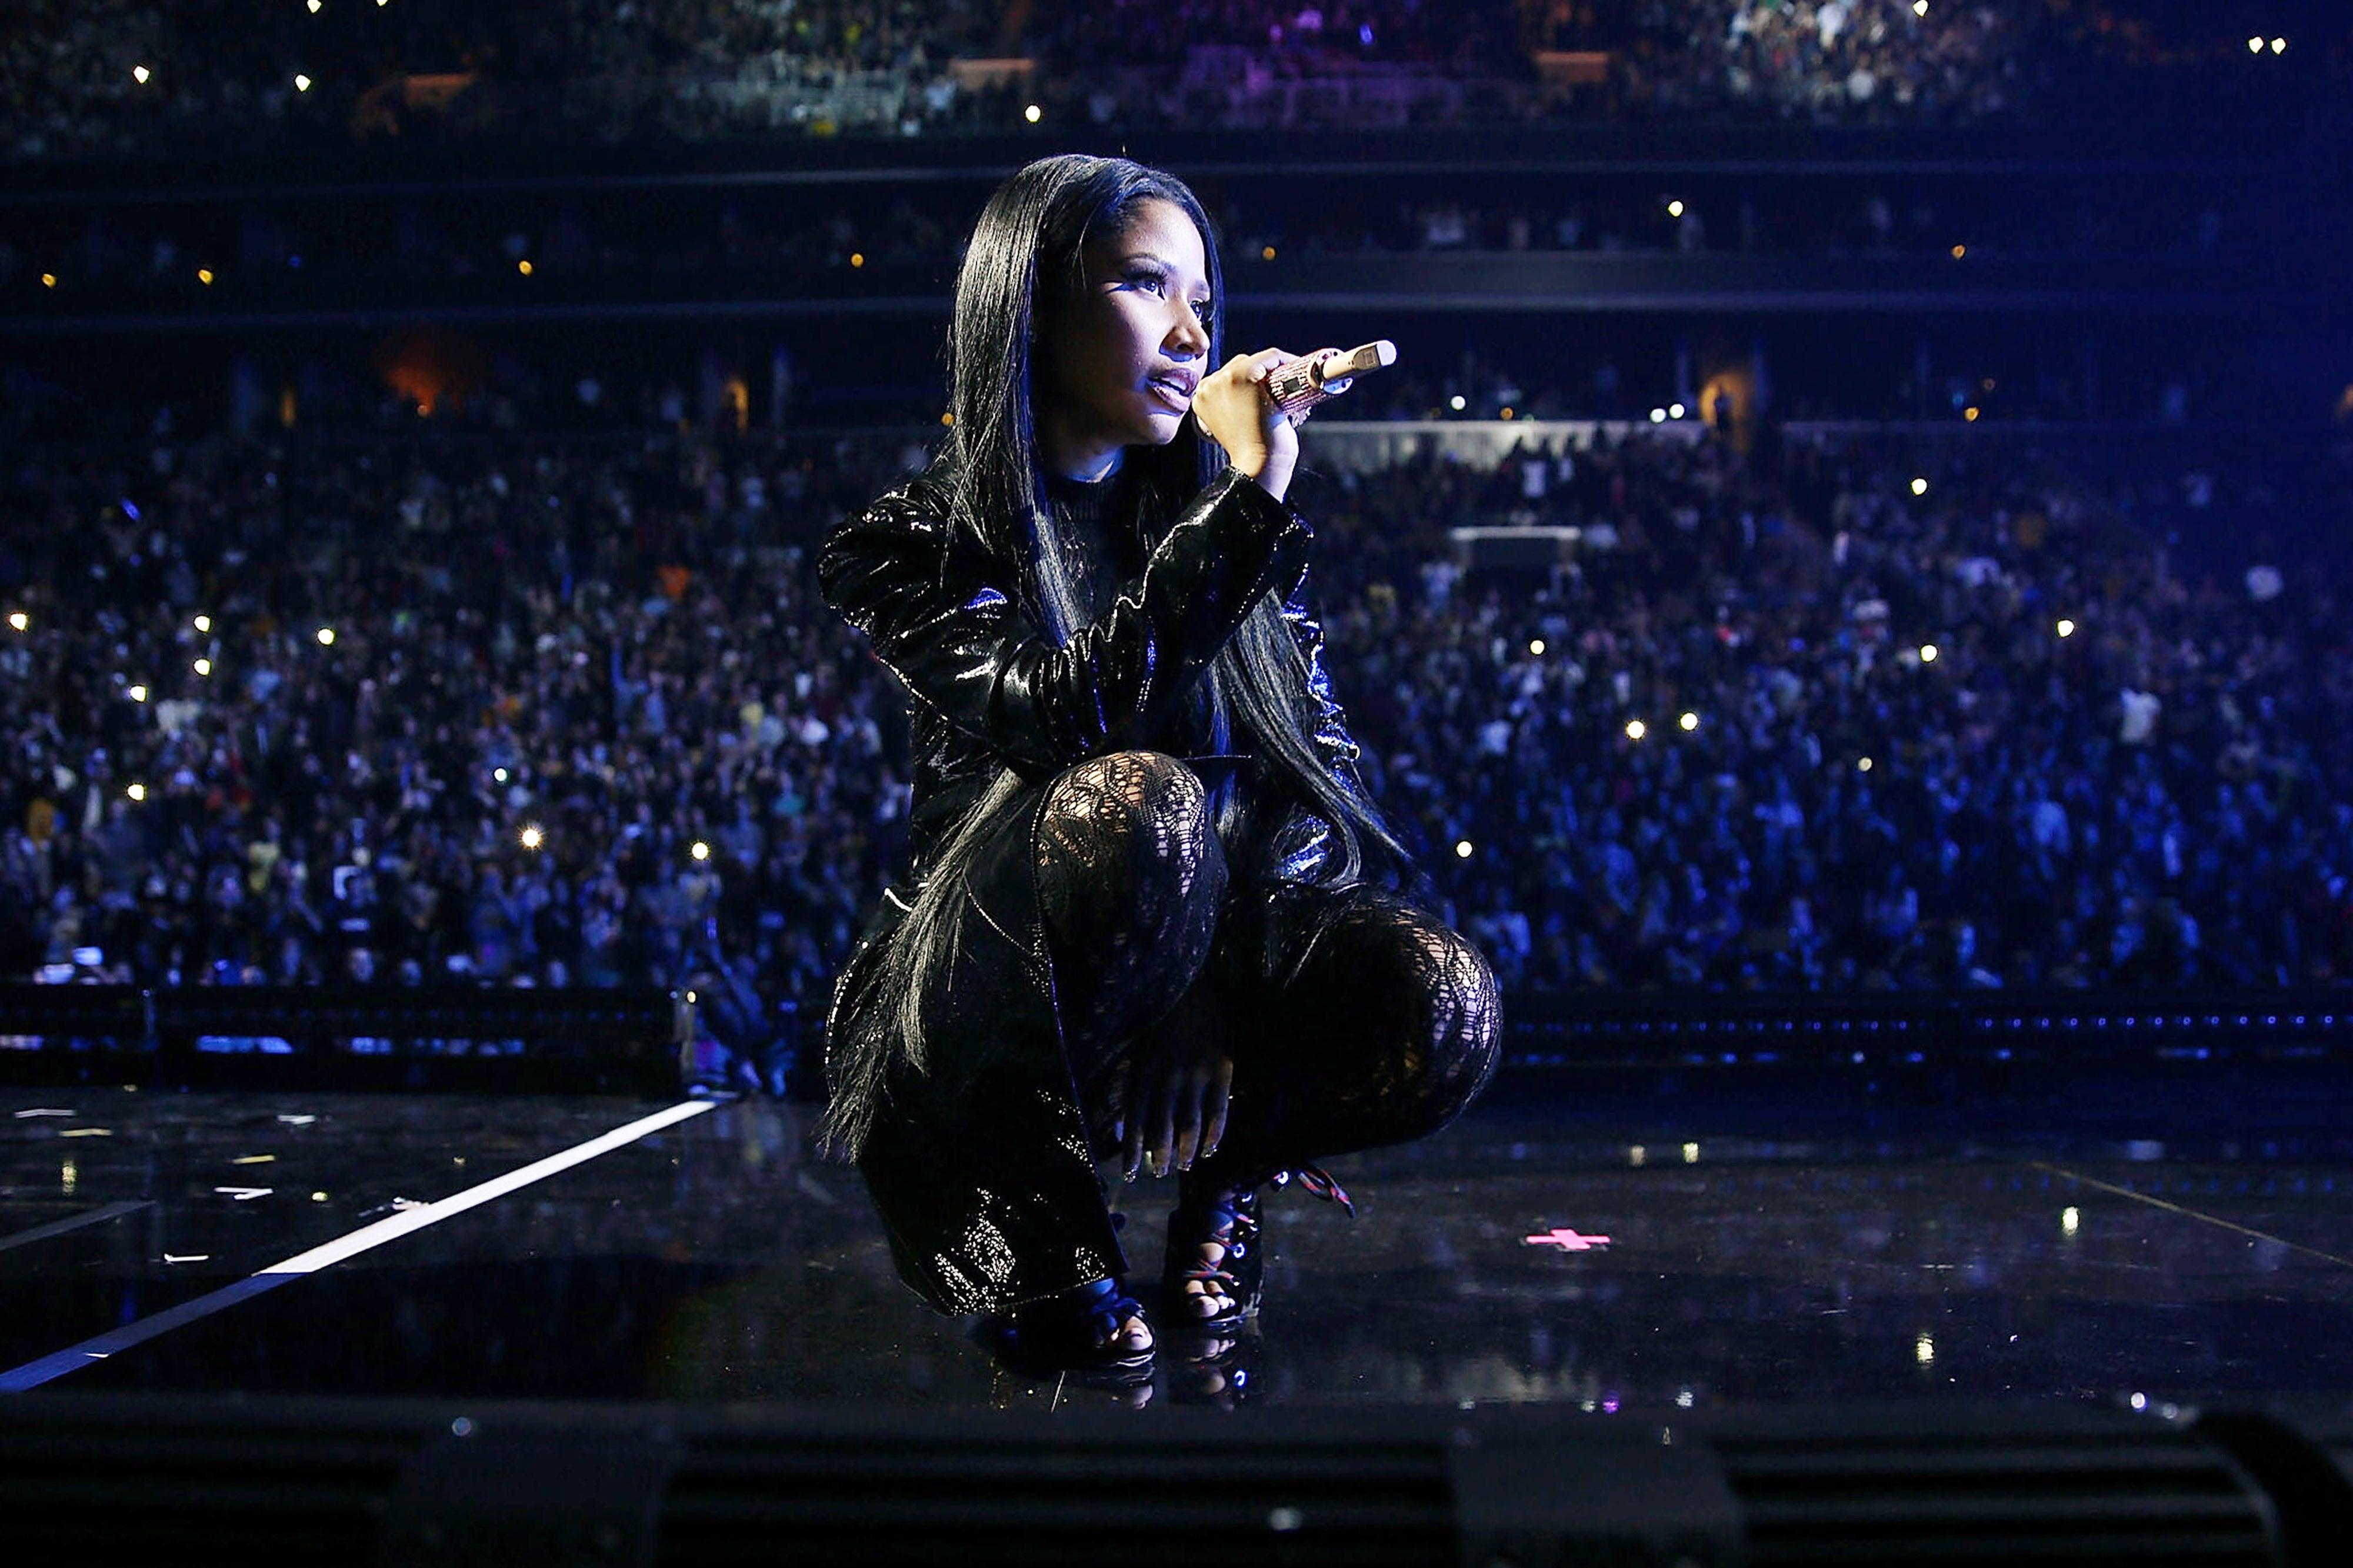 Nicki Minaj Says She Didn't Mean to Slam Donald Trump's Wife Melania in Rap: 'She Seems Nice'